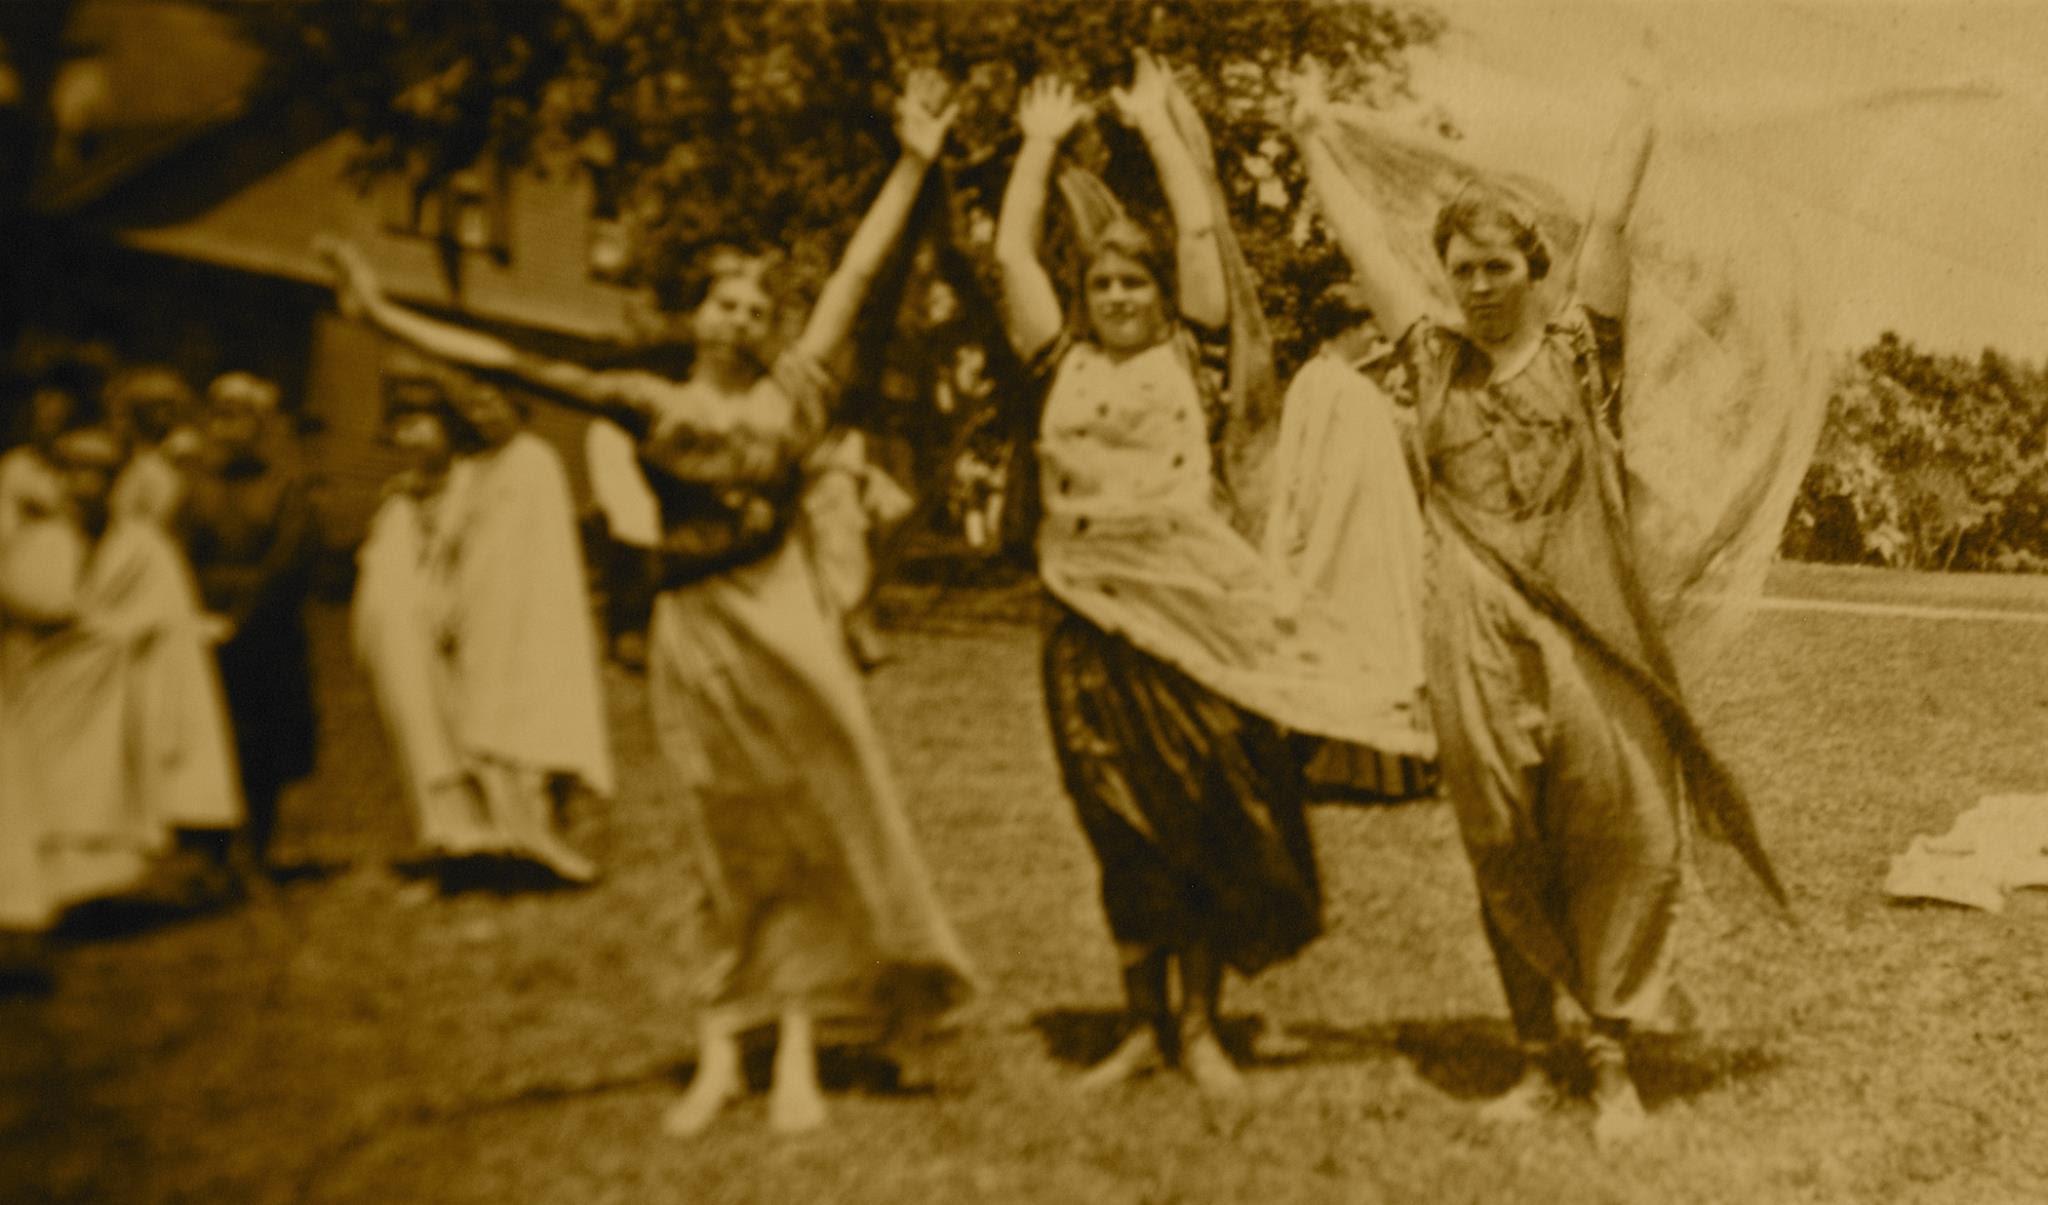 The Bennett School for Girls c.1910s. Image courtesy of the Millbrook Library.